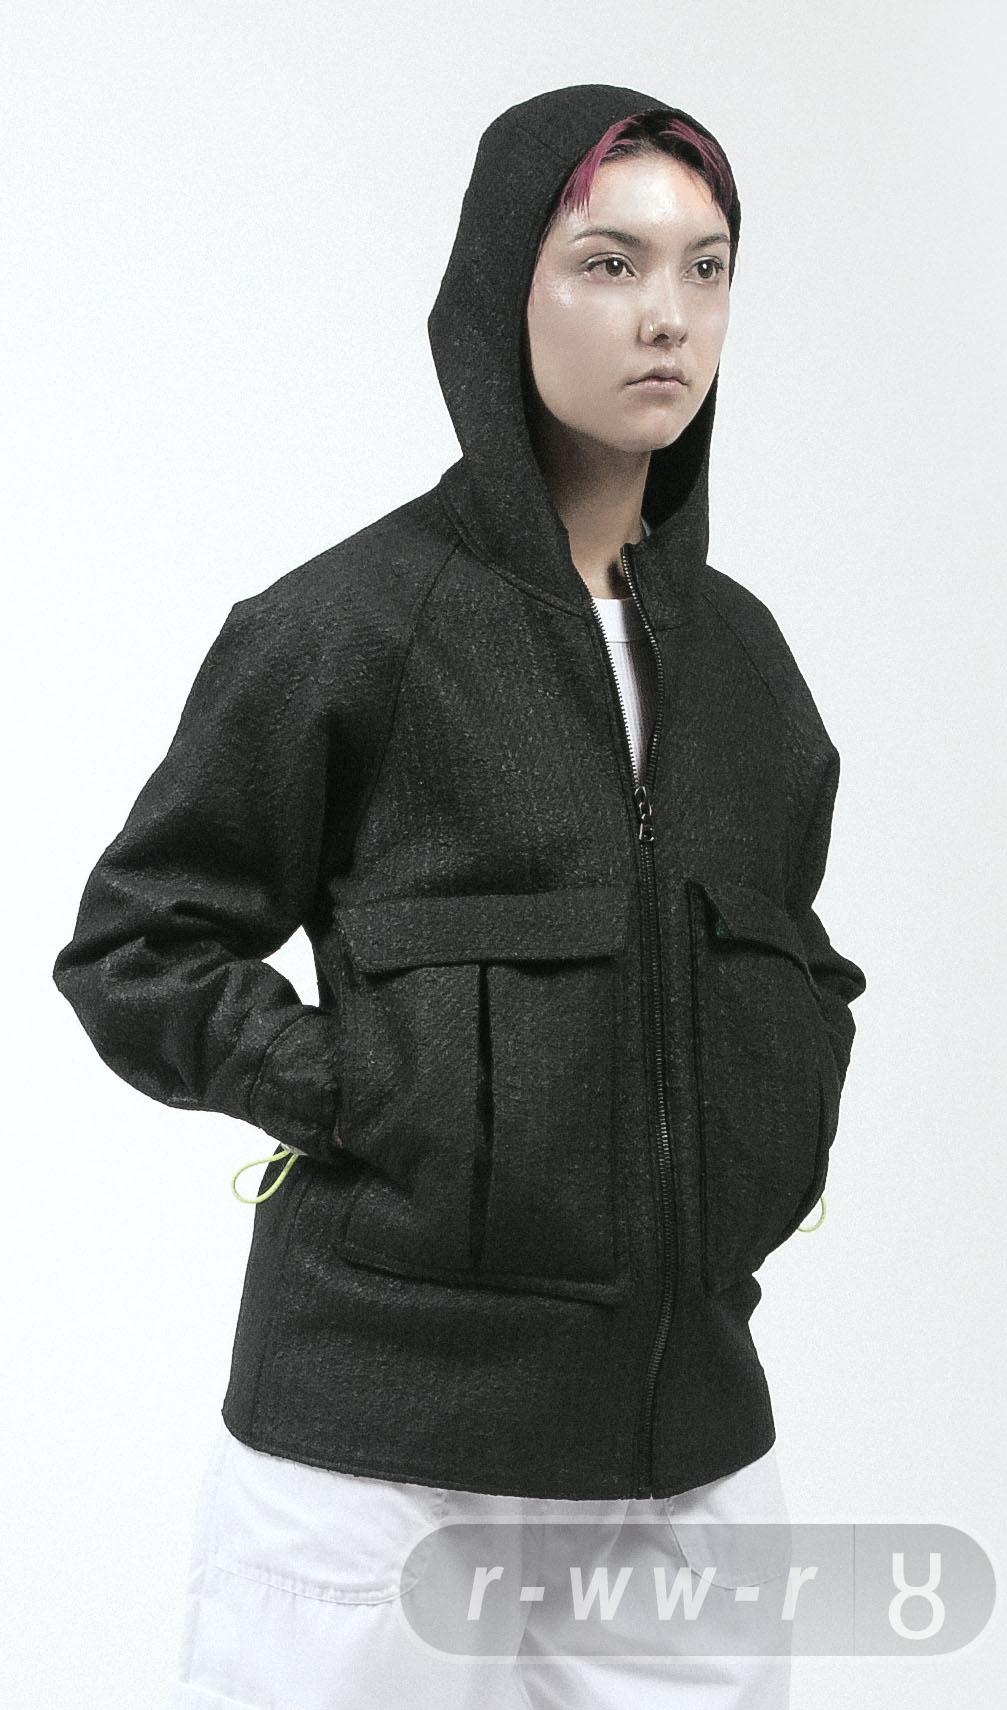 sharewear jacket.jpg